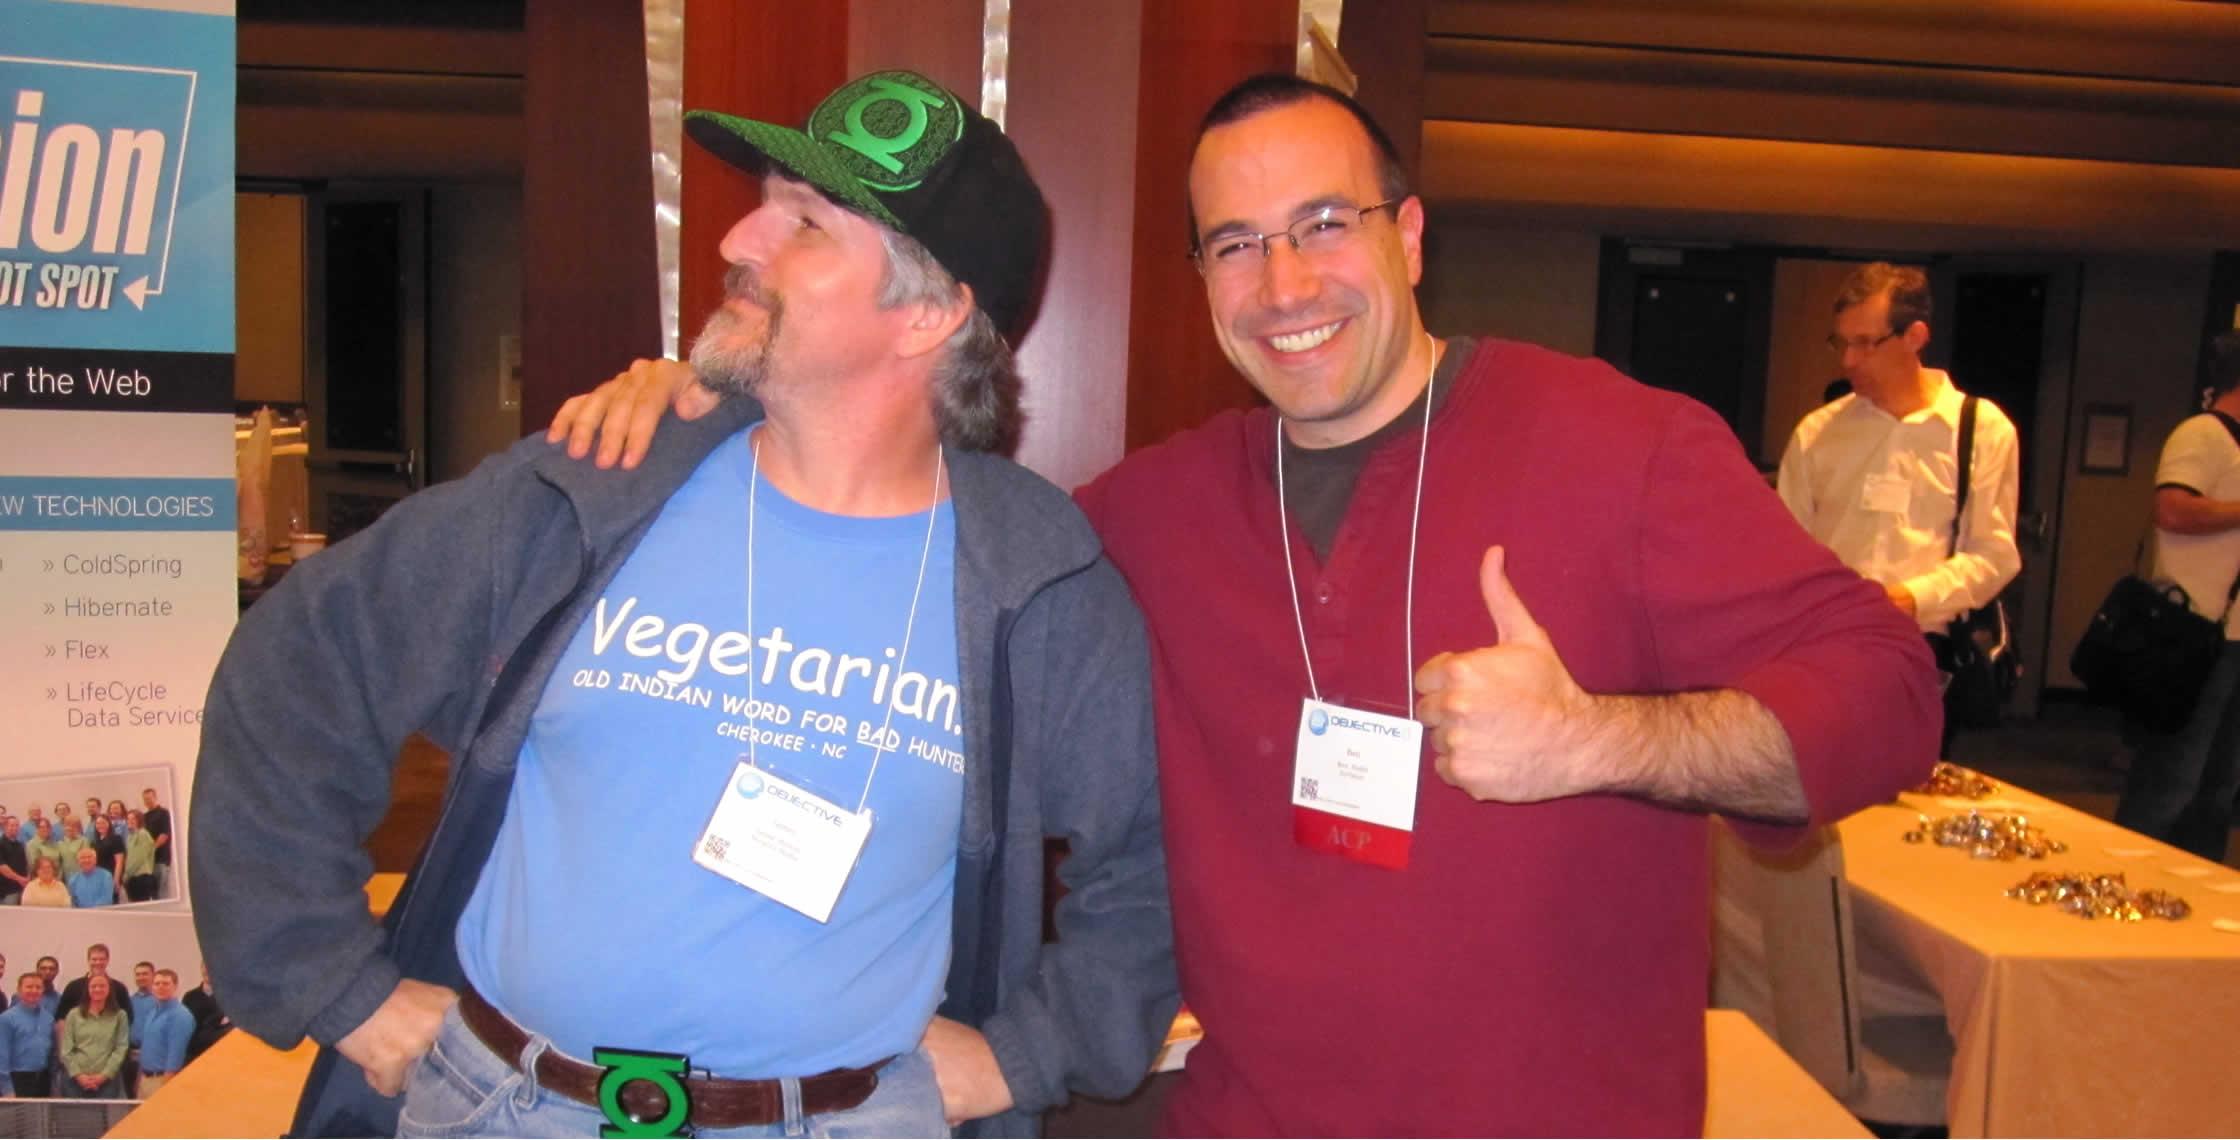 Ben Nadel at cf.Objective() 2012 (Minneapolis, MN) with: James Husum